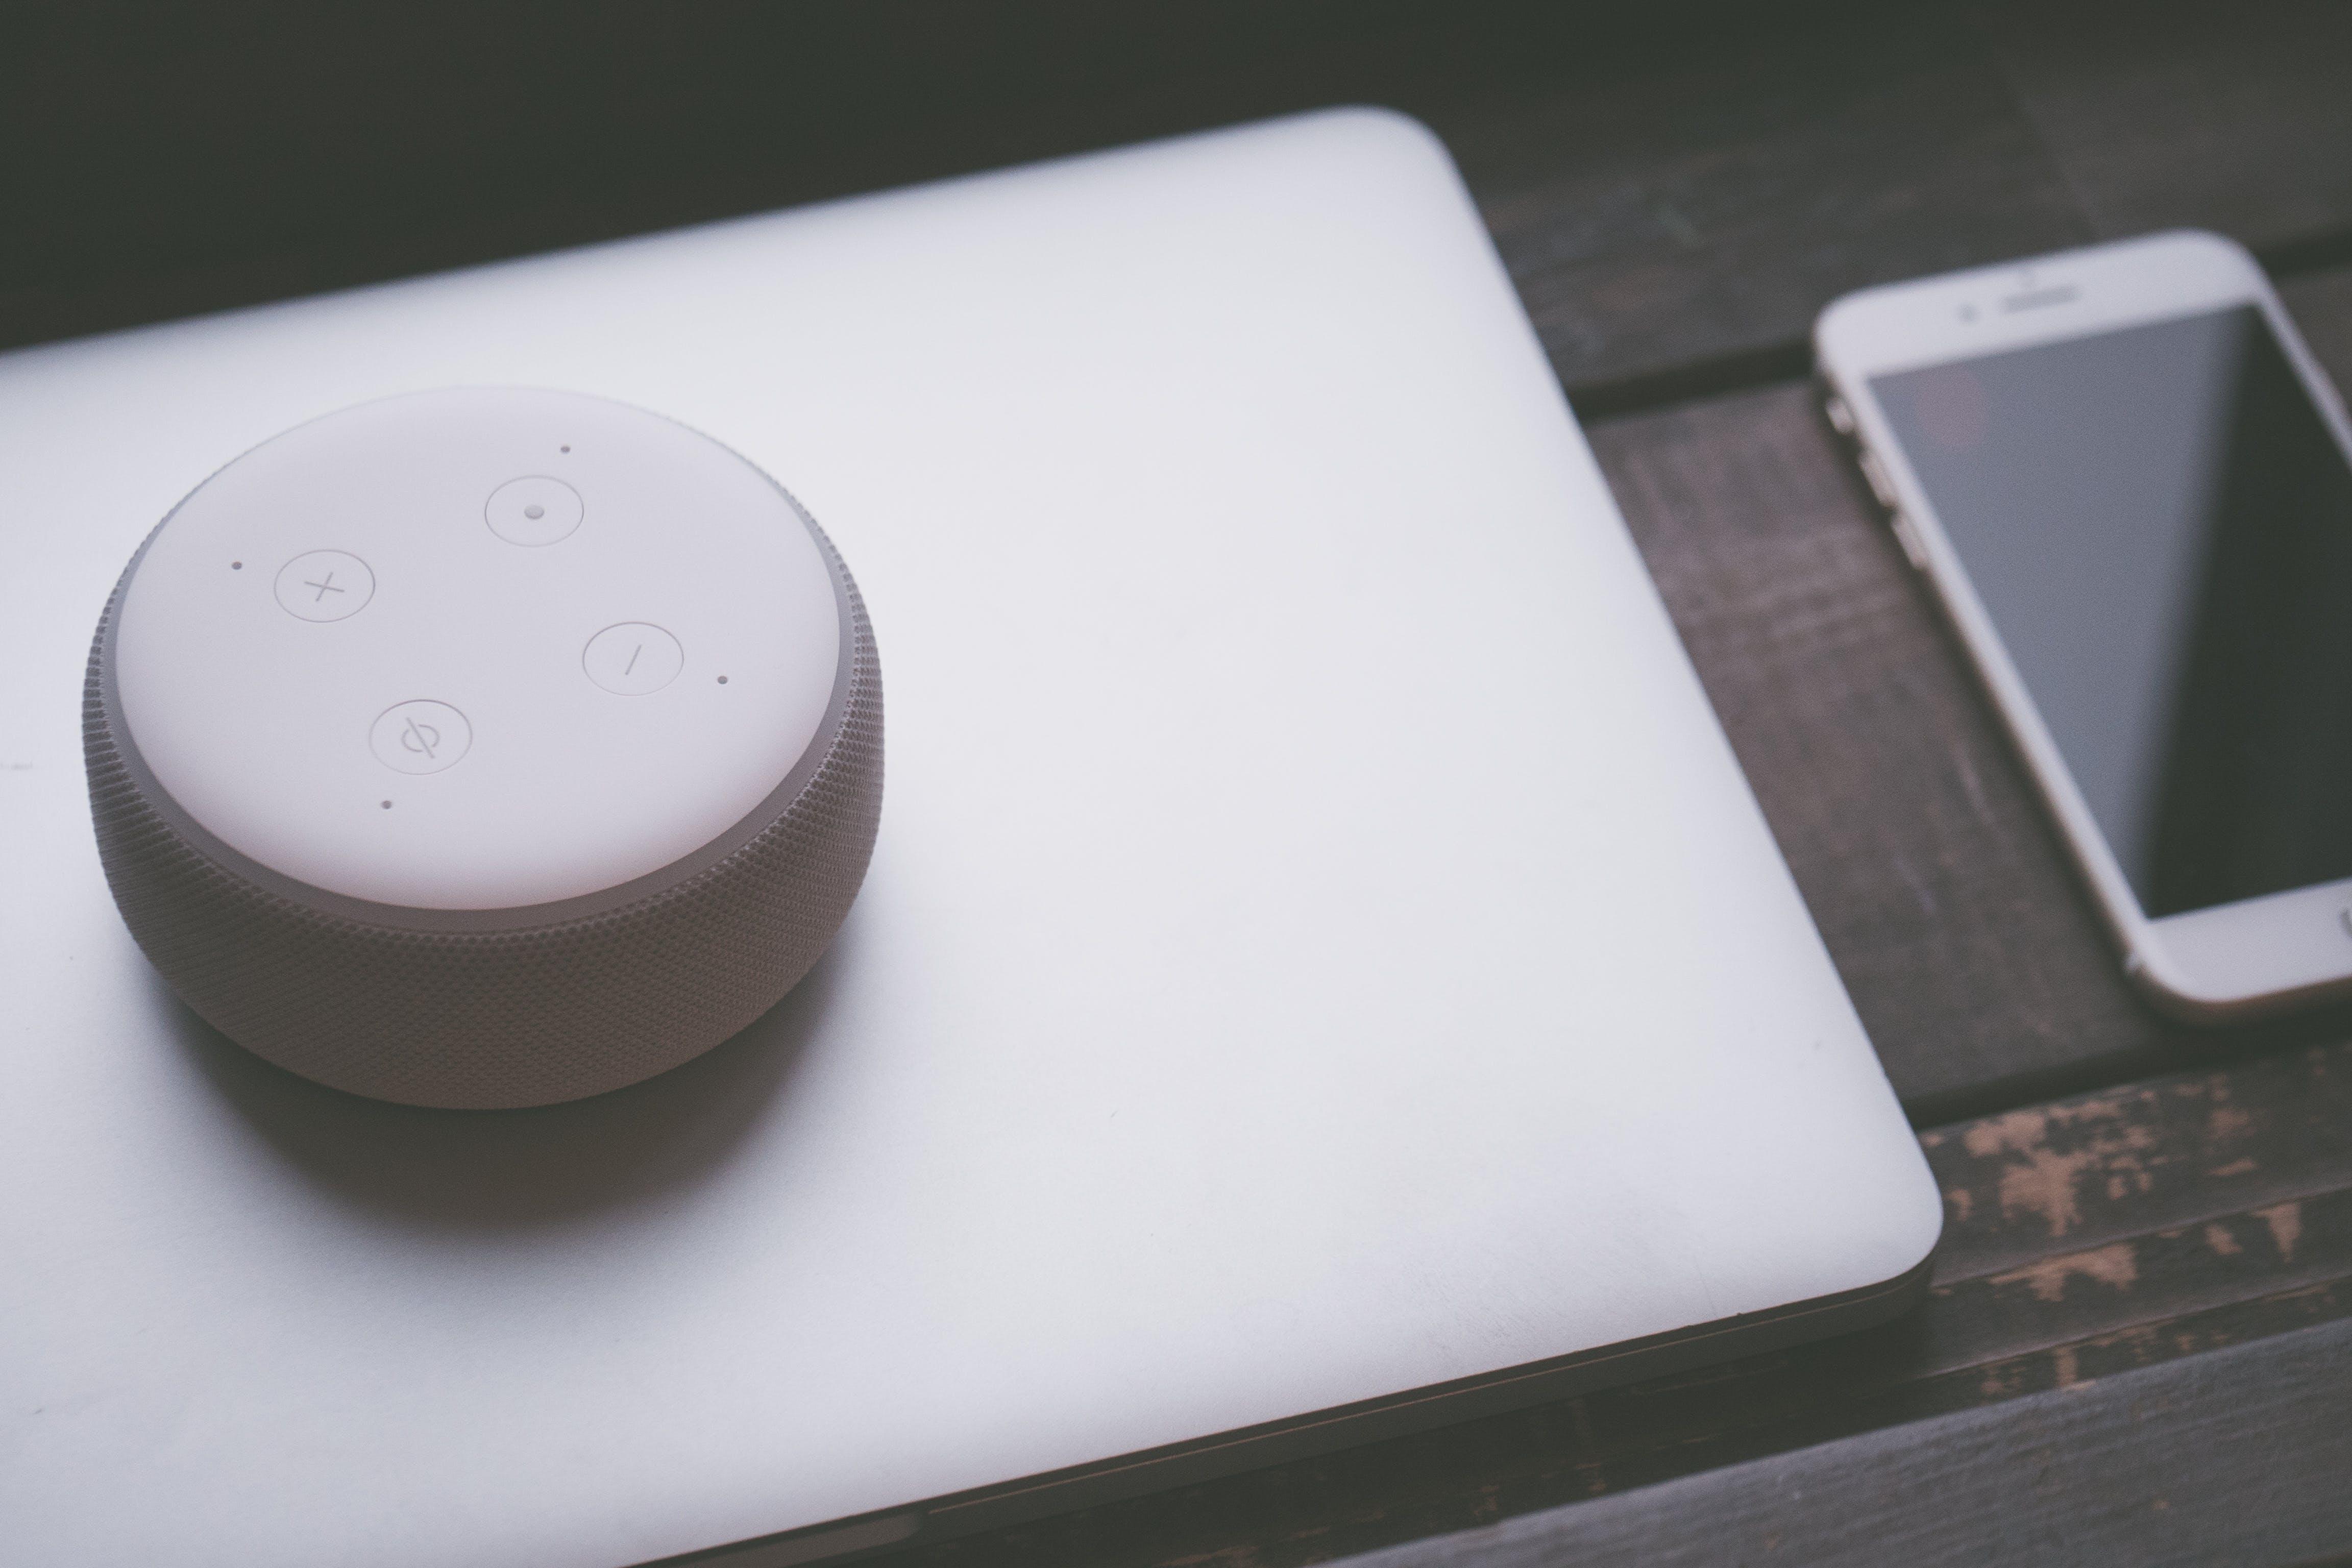 White Bluetooth Speaker On Silver Laptop Computer